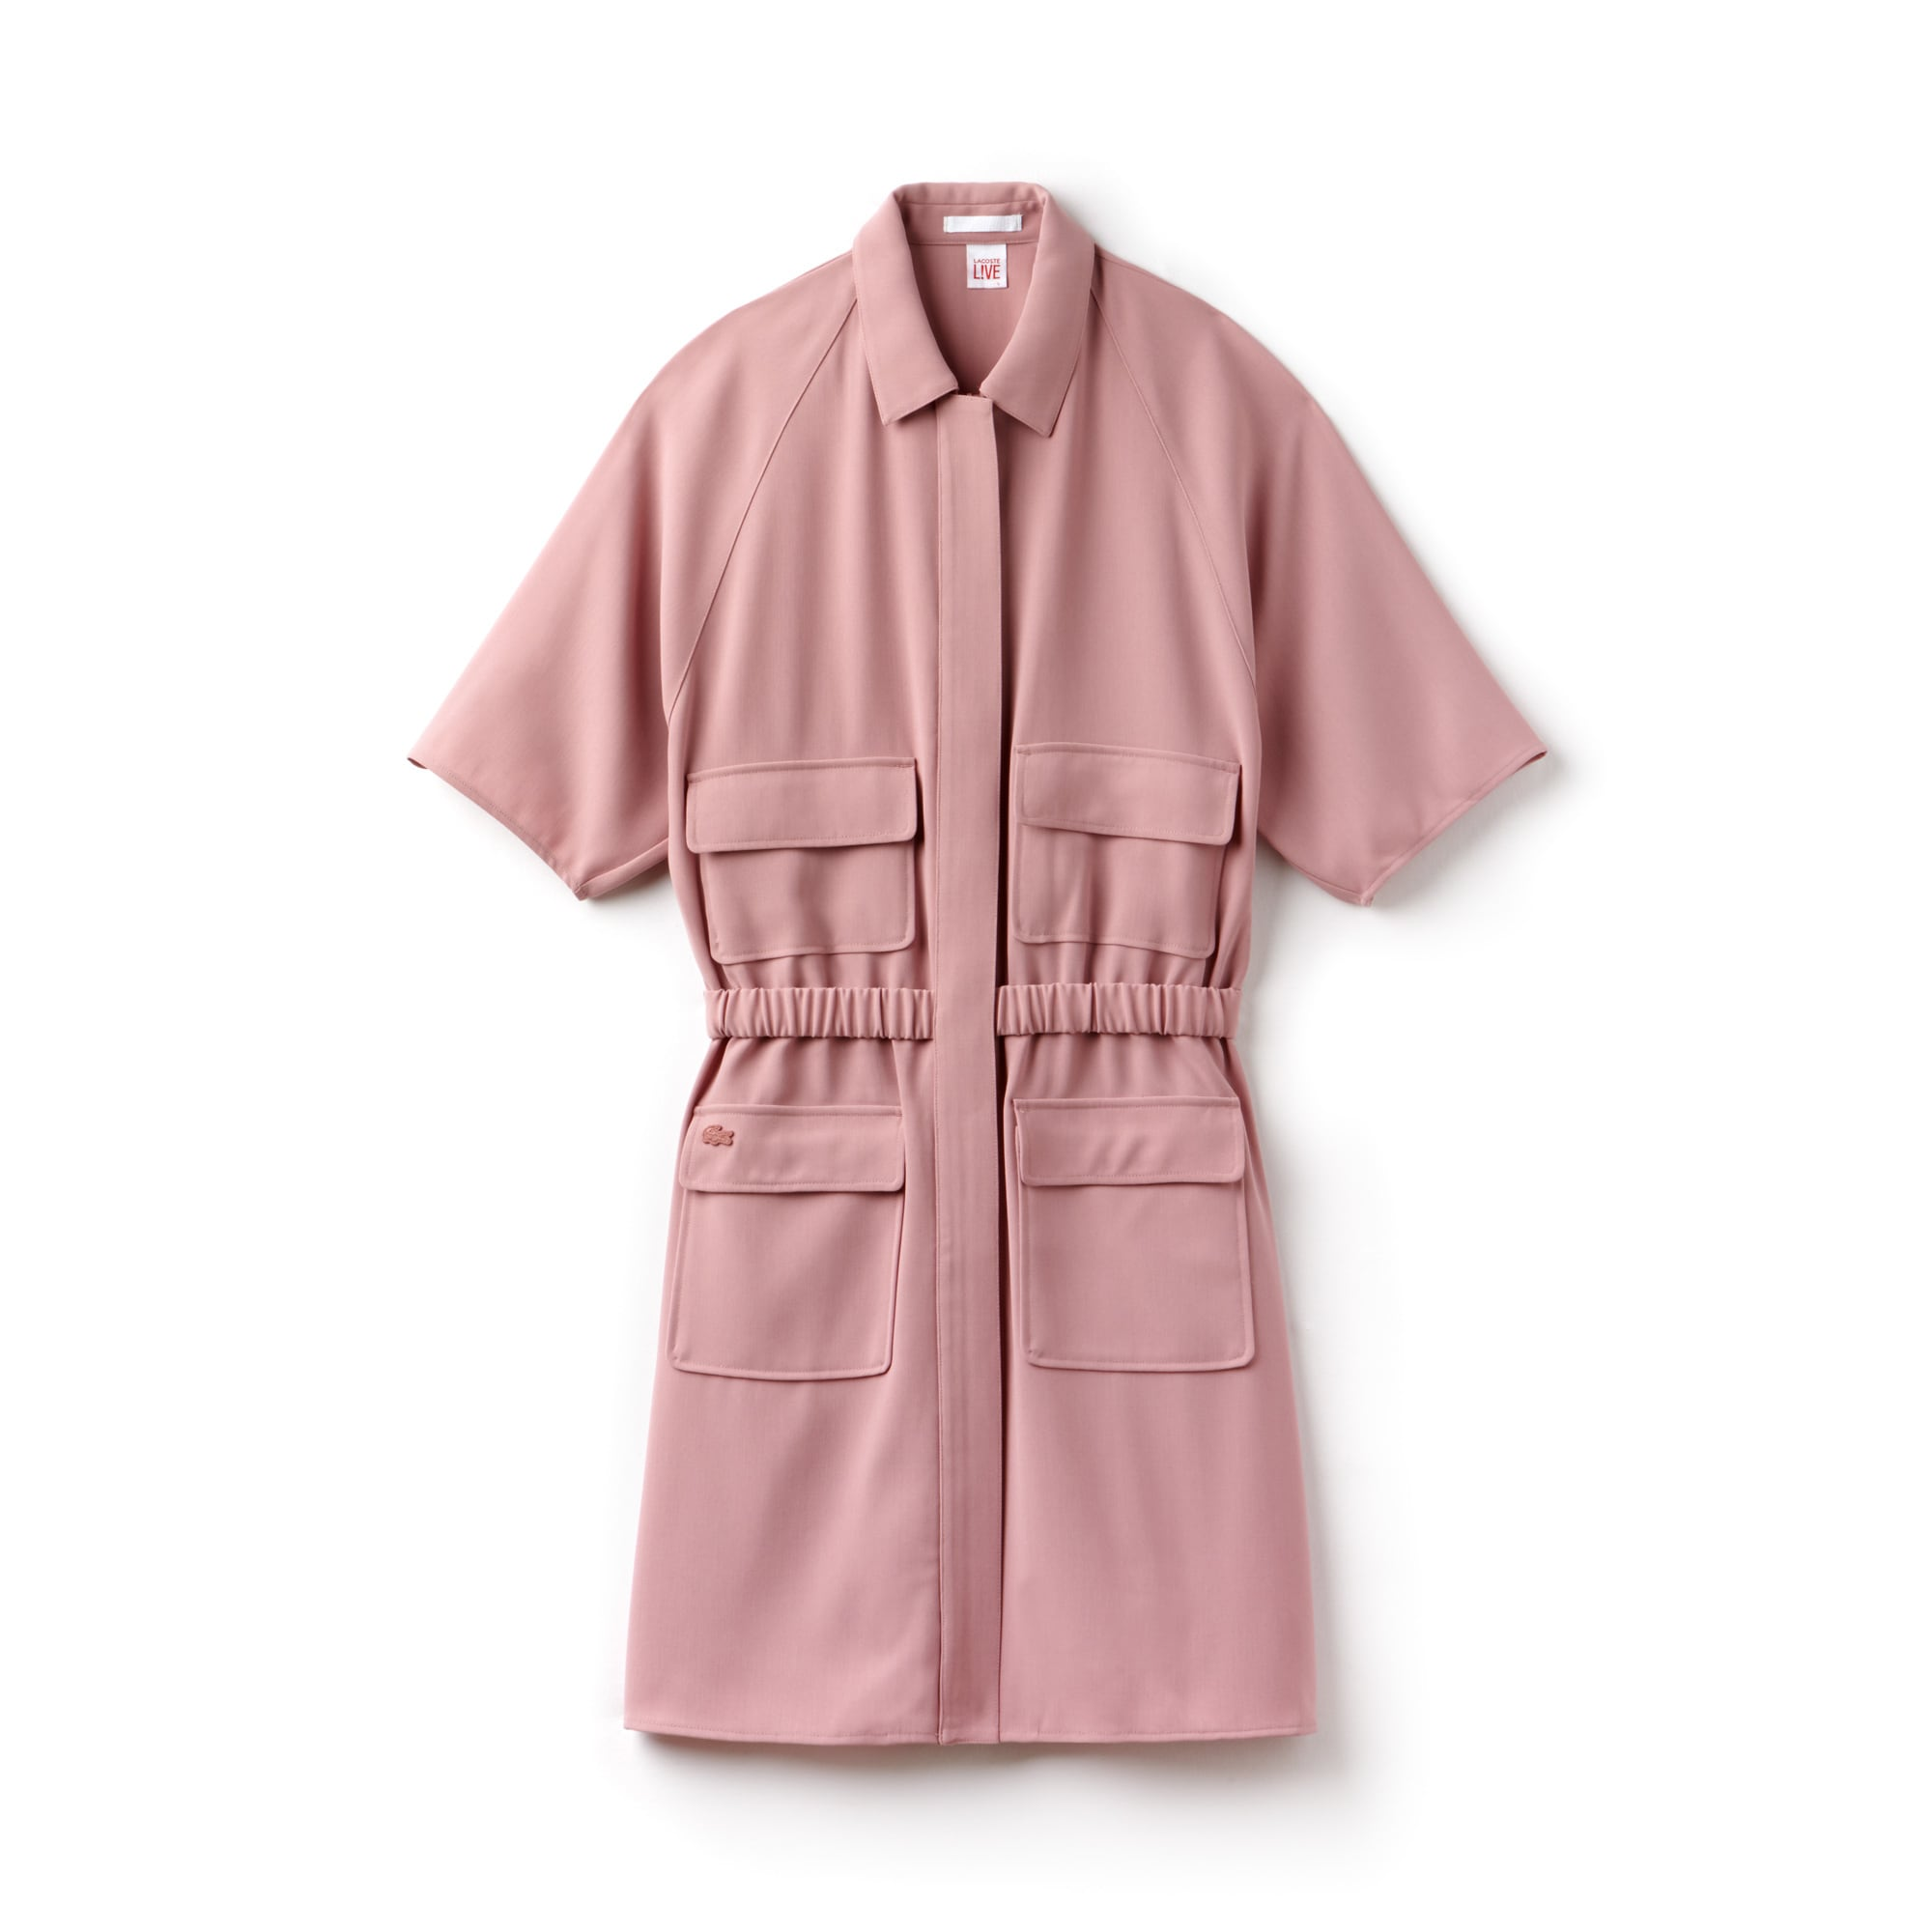 Lacoste LIVE-jurk dames crêpe met rits